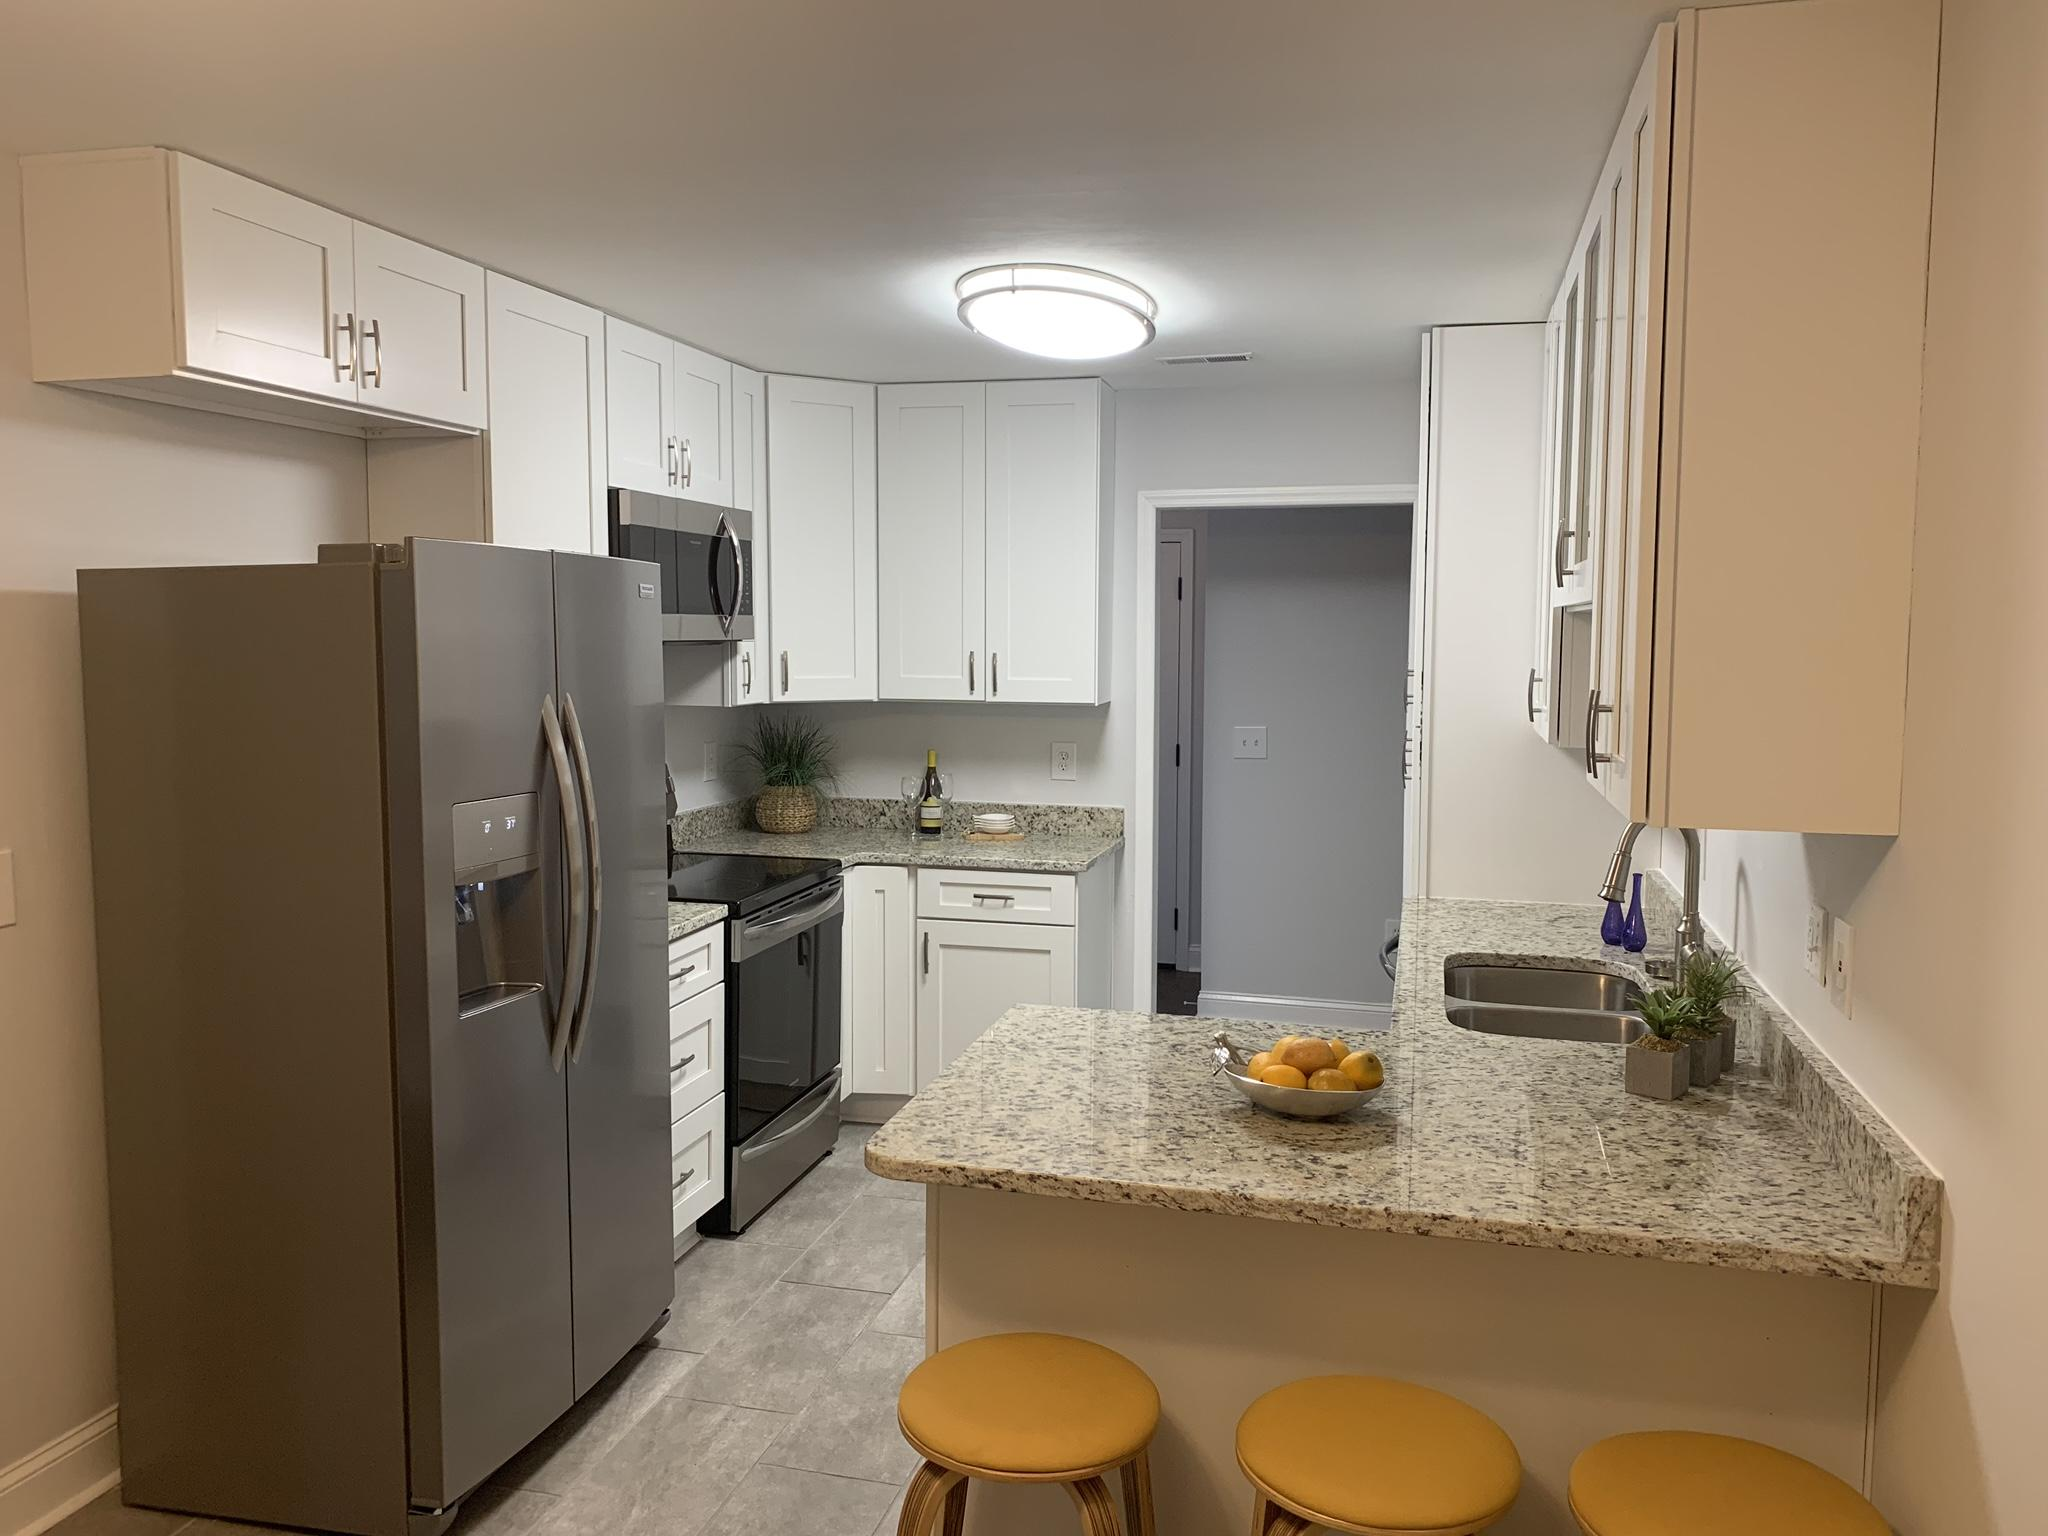 Heathwood Ext Homes For Sale - 2 Blaine, Charleston, SC - 3